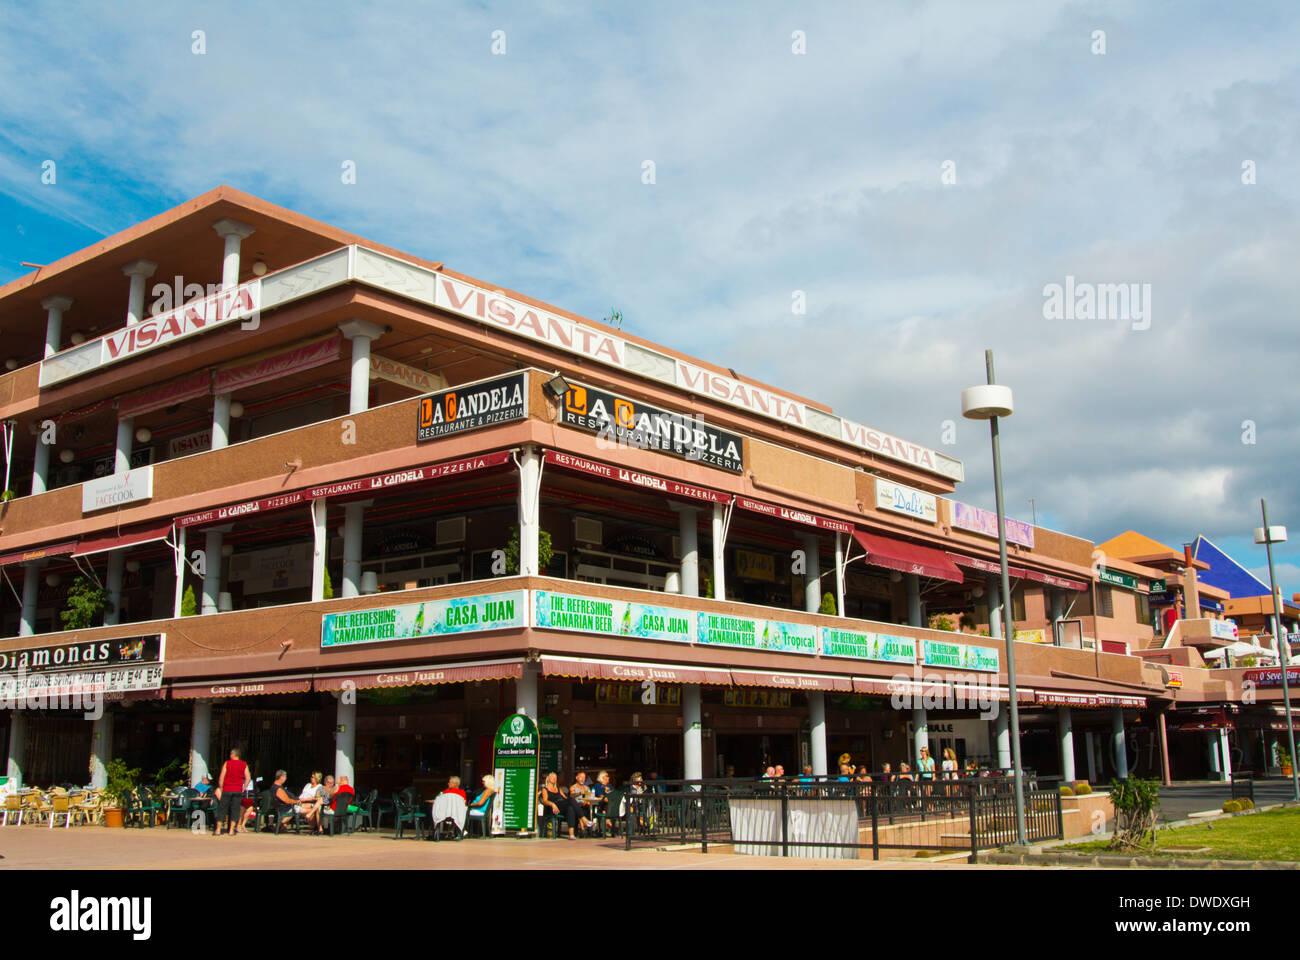 Spanish Restaurants In City Island